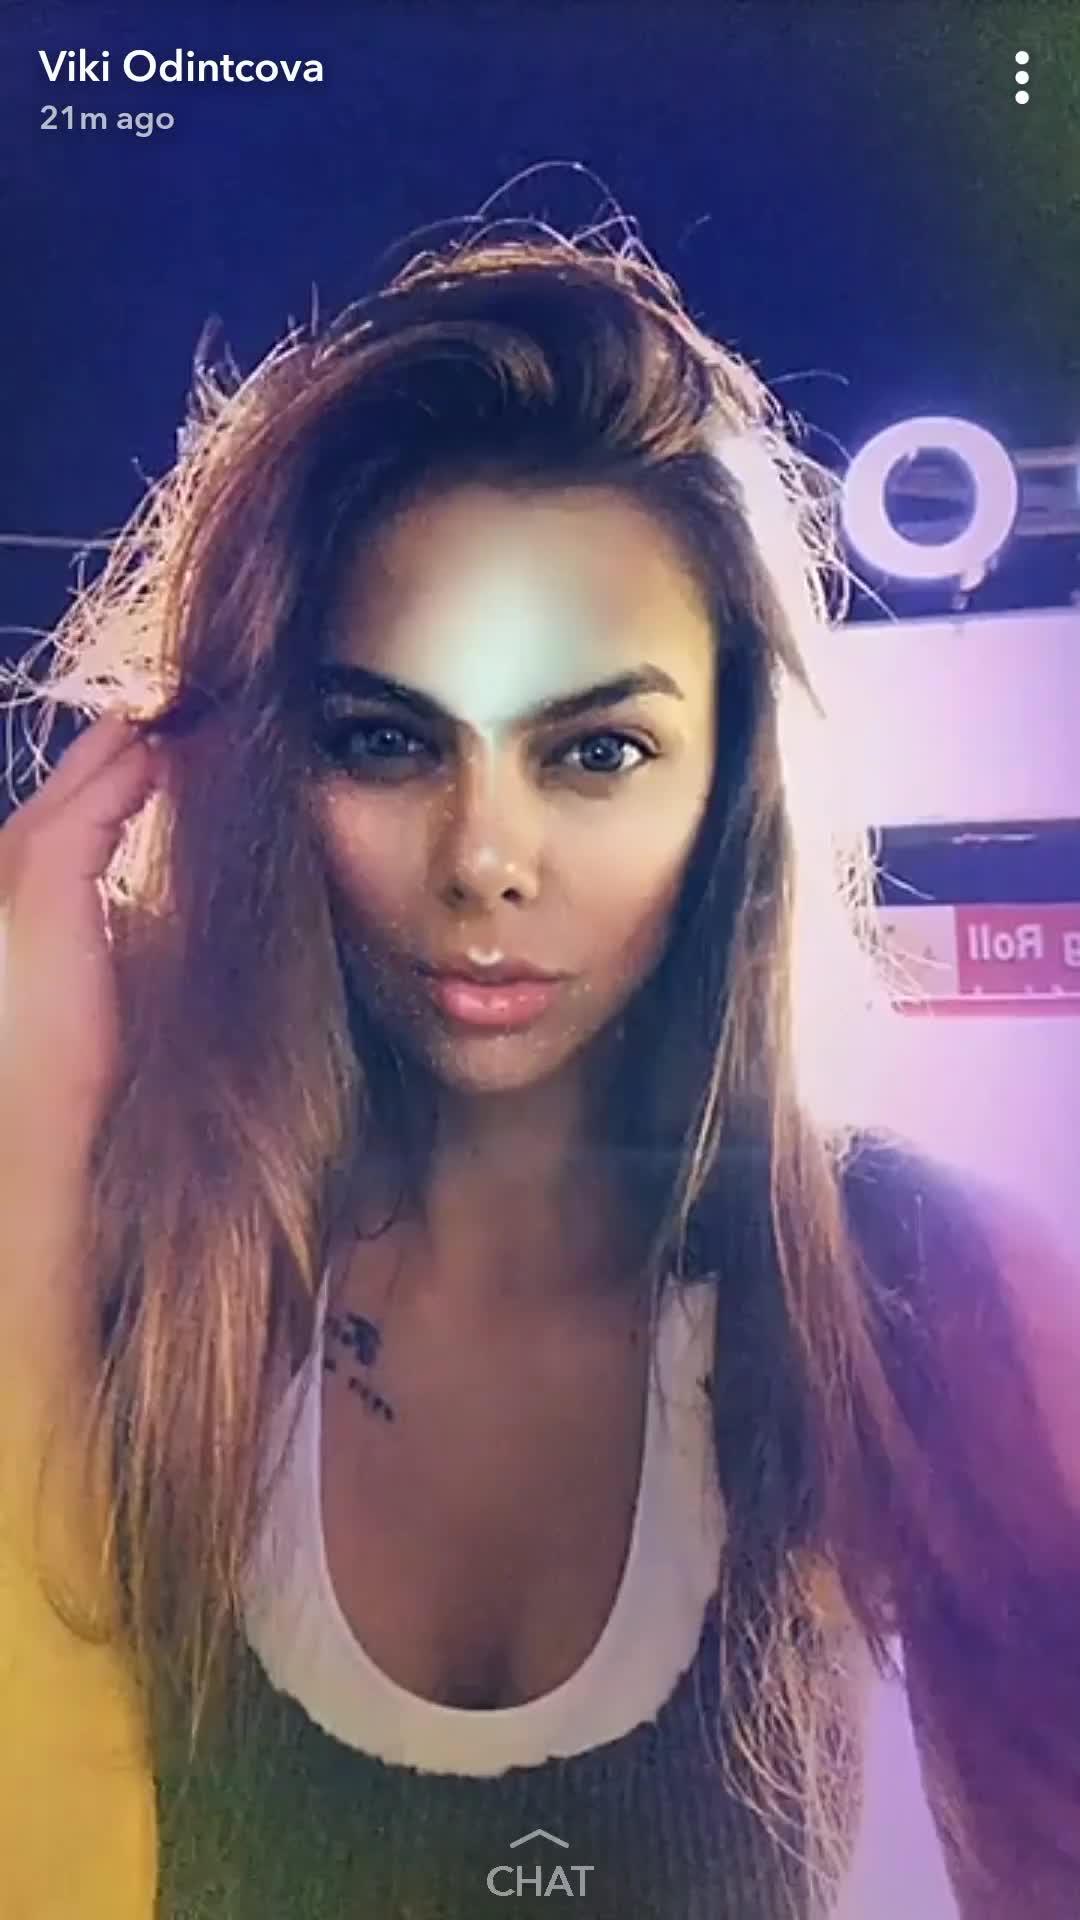 Celebrity Viki Odintcova nude (56 photo), Sexy, Cleavage, Selfie, see through 2017